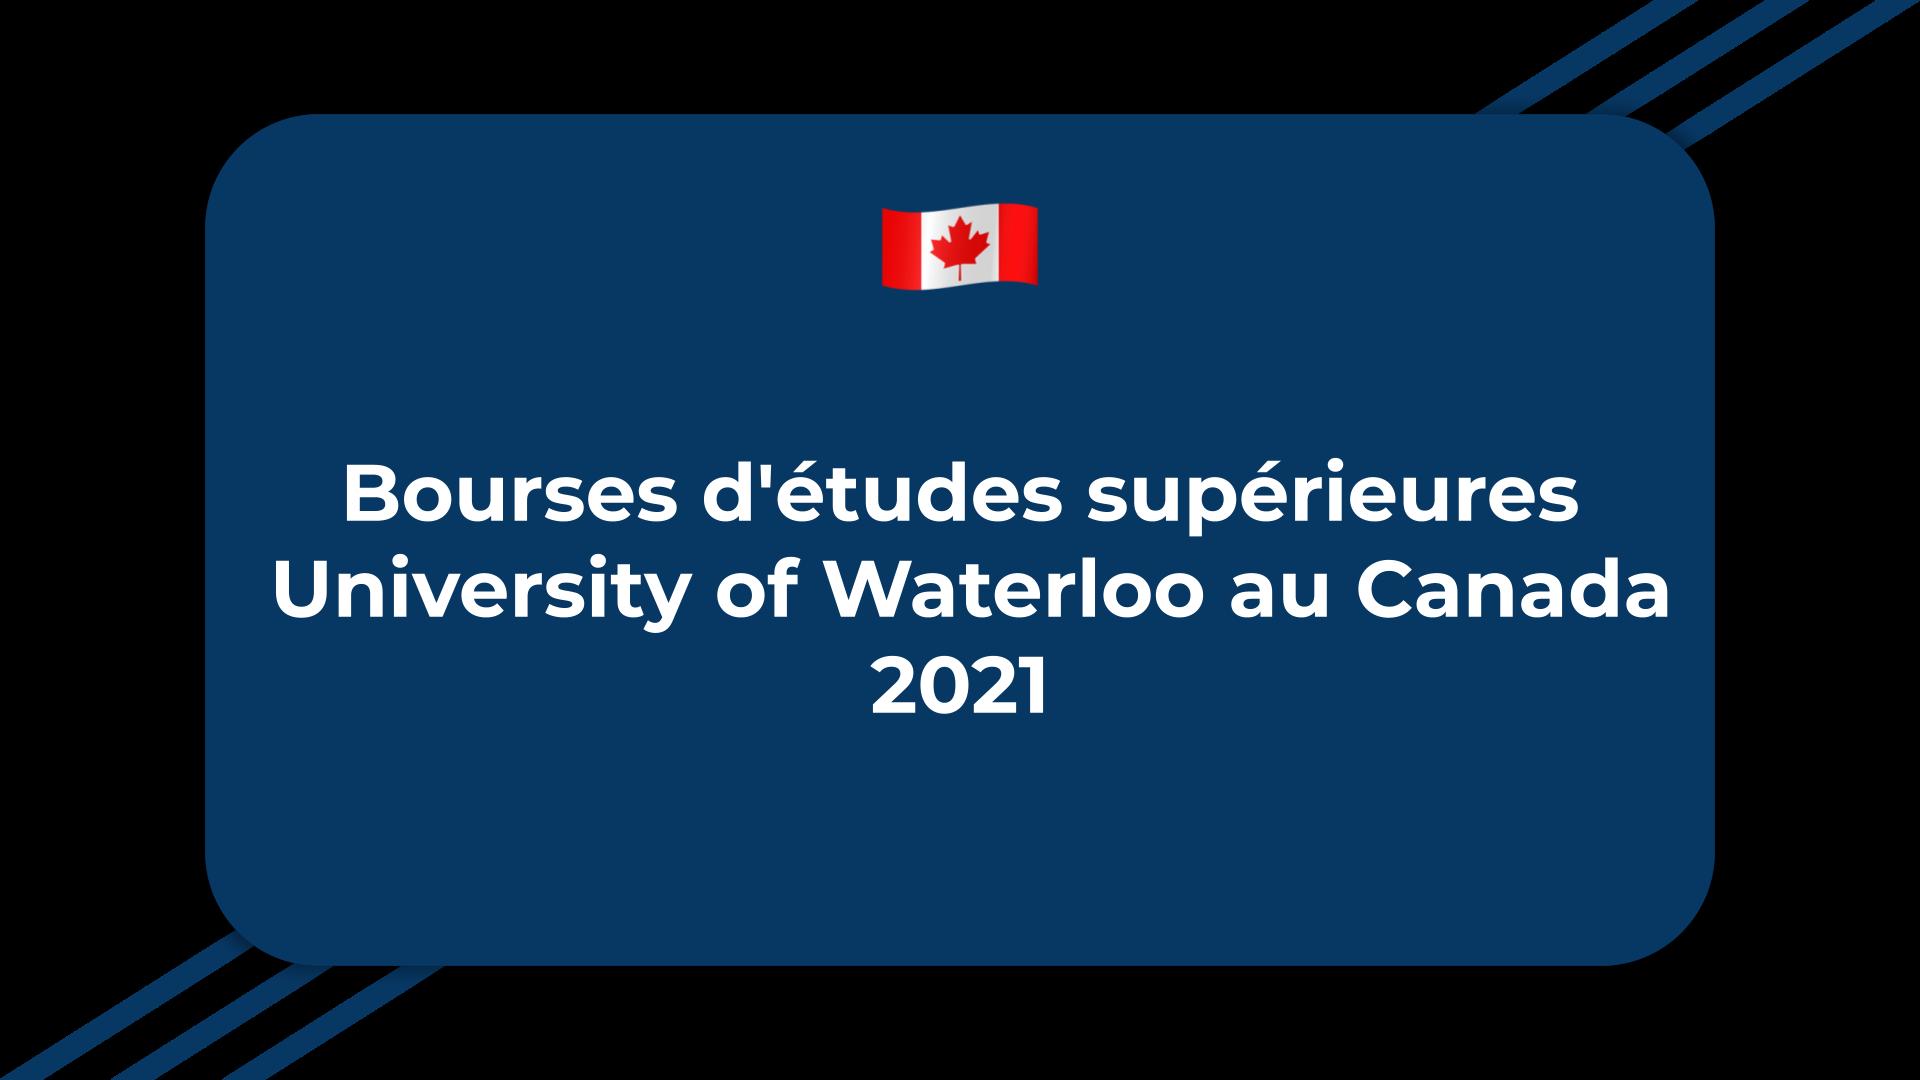 Bourses d'études supérieures University of Waterloo